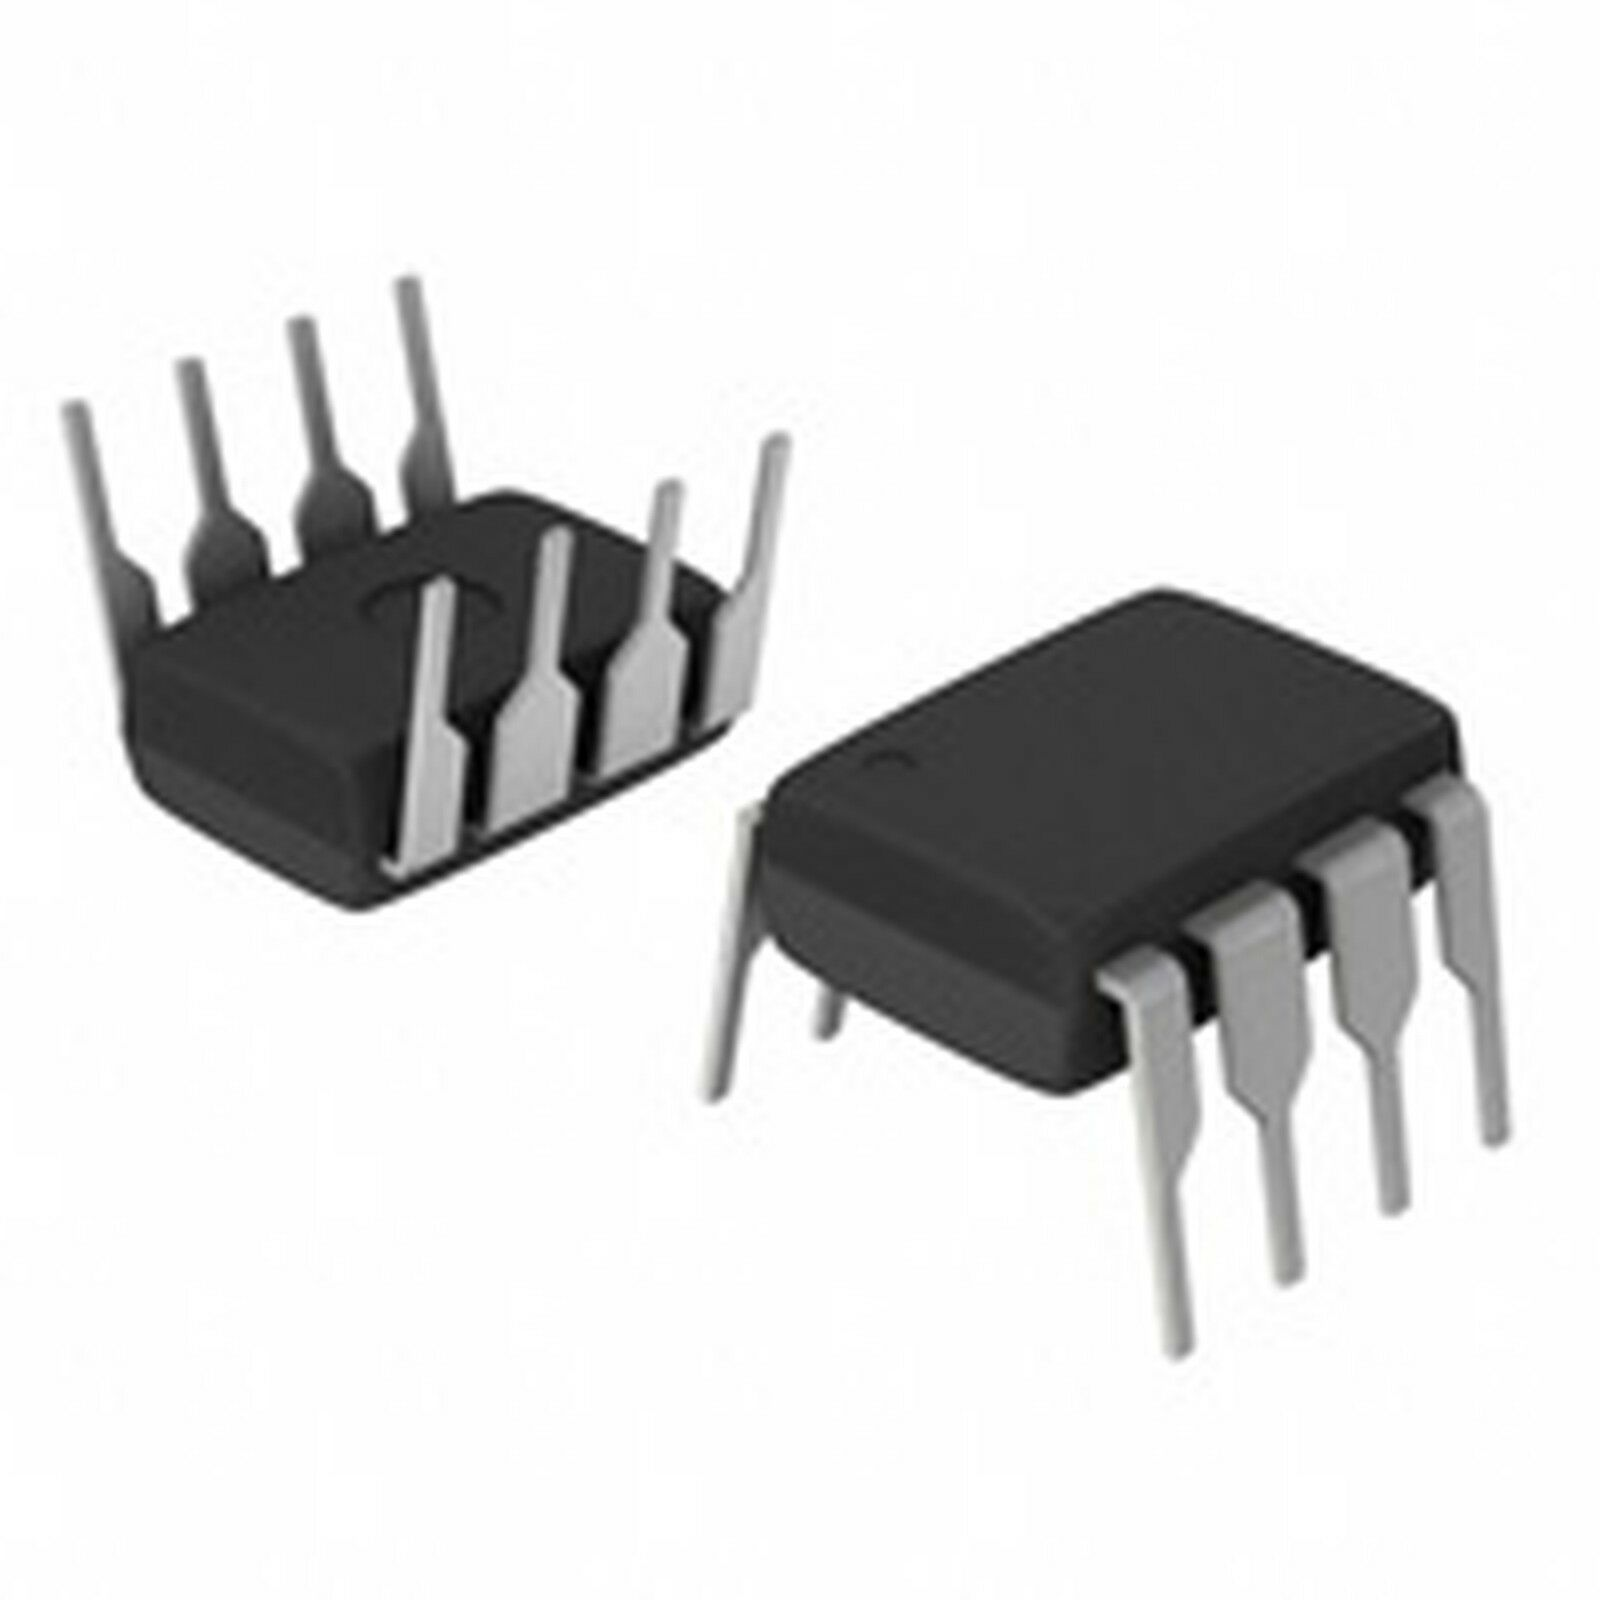 UC3845BNG  ONSEMI  Current-PWM Controller 1A 8,2-30V 500kHz DIP8  NEW #BP 2 pcs